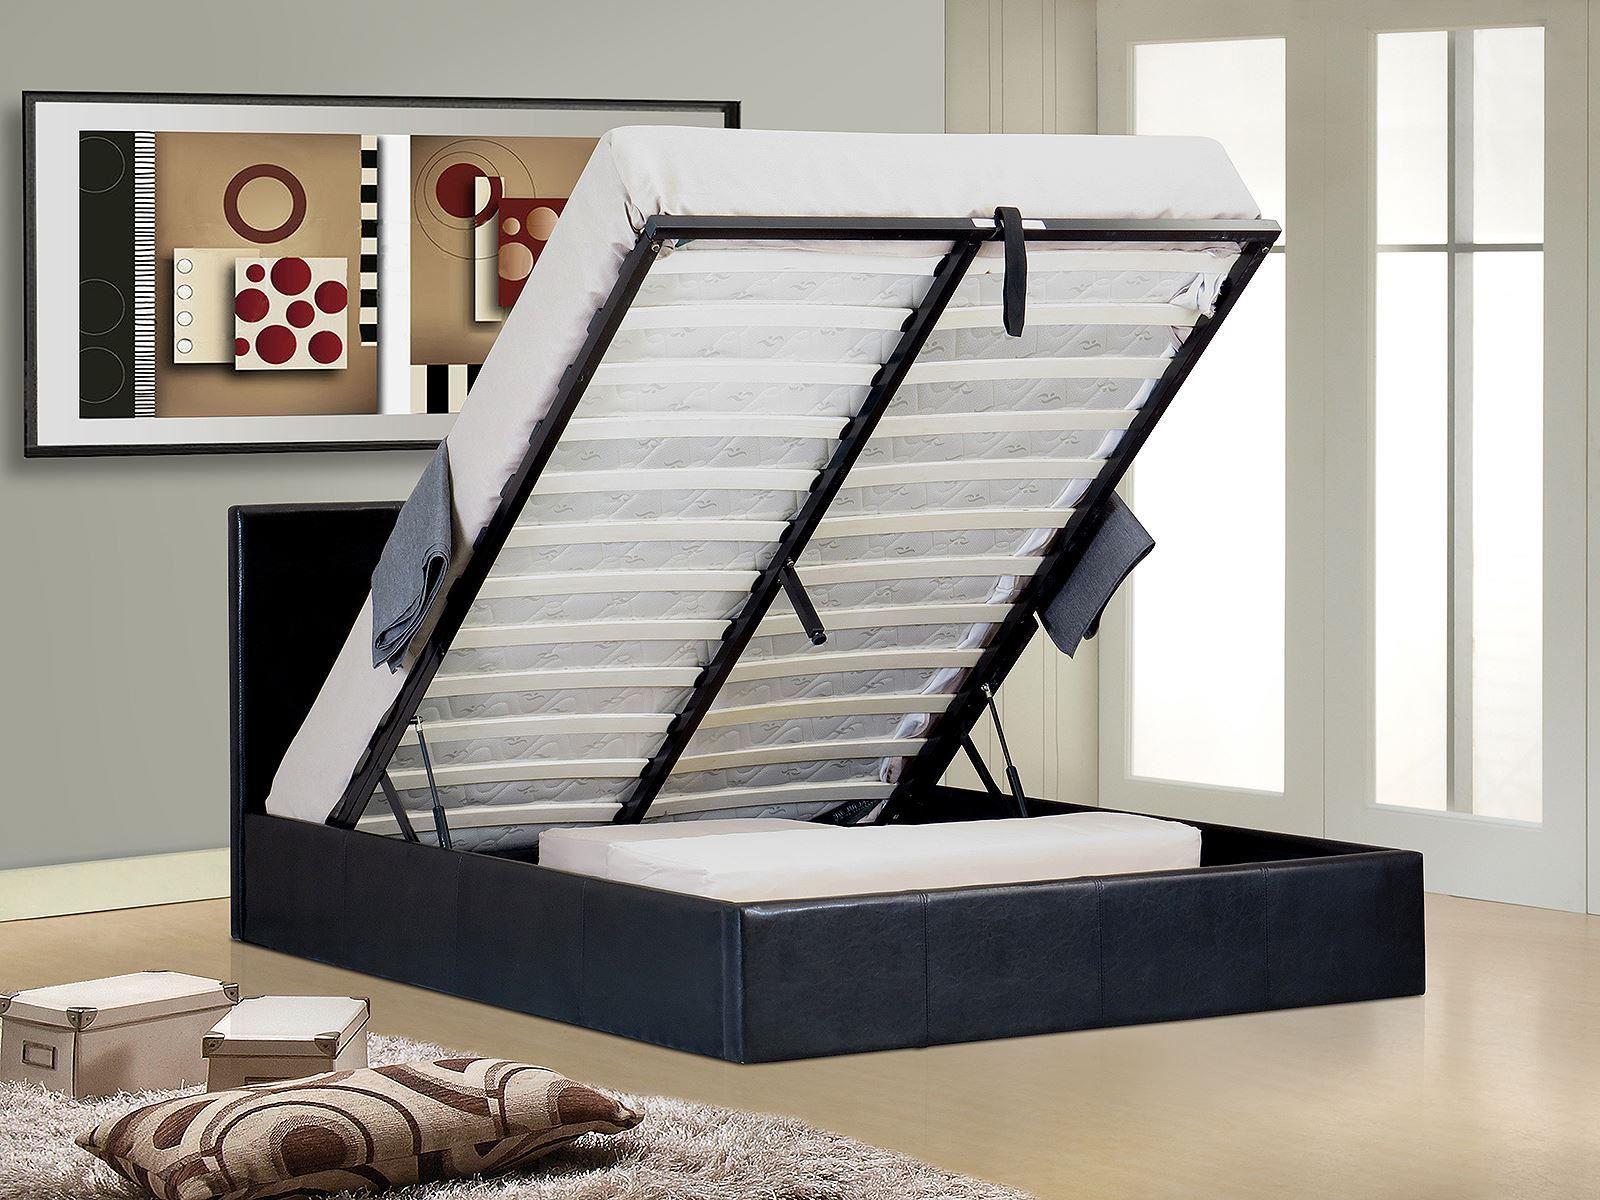 Ottoman stylist gaslift storage double kingsize bed frame for Diy ottoman bed frame